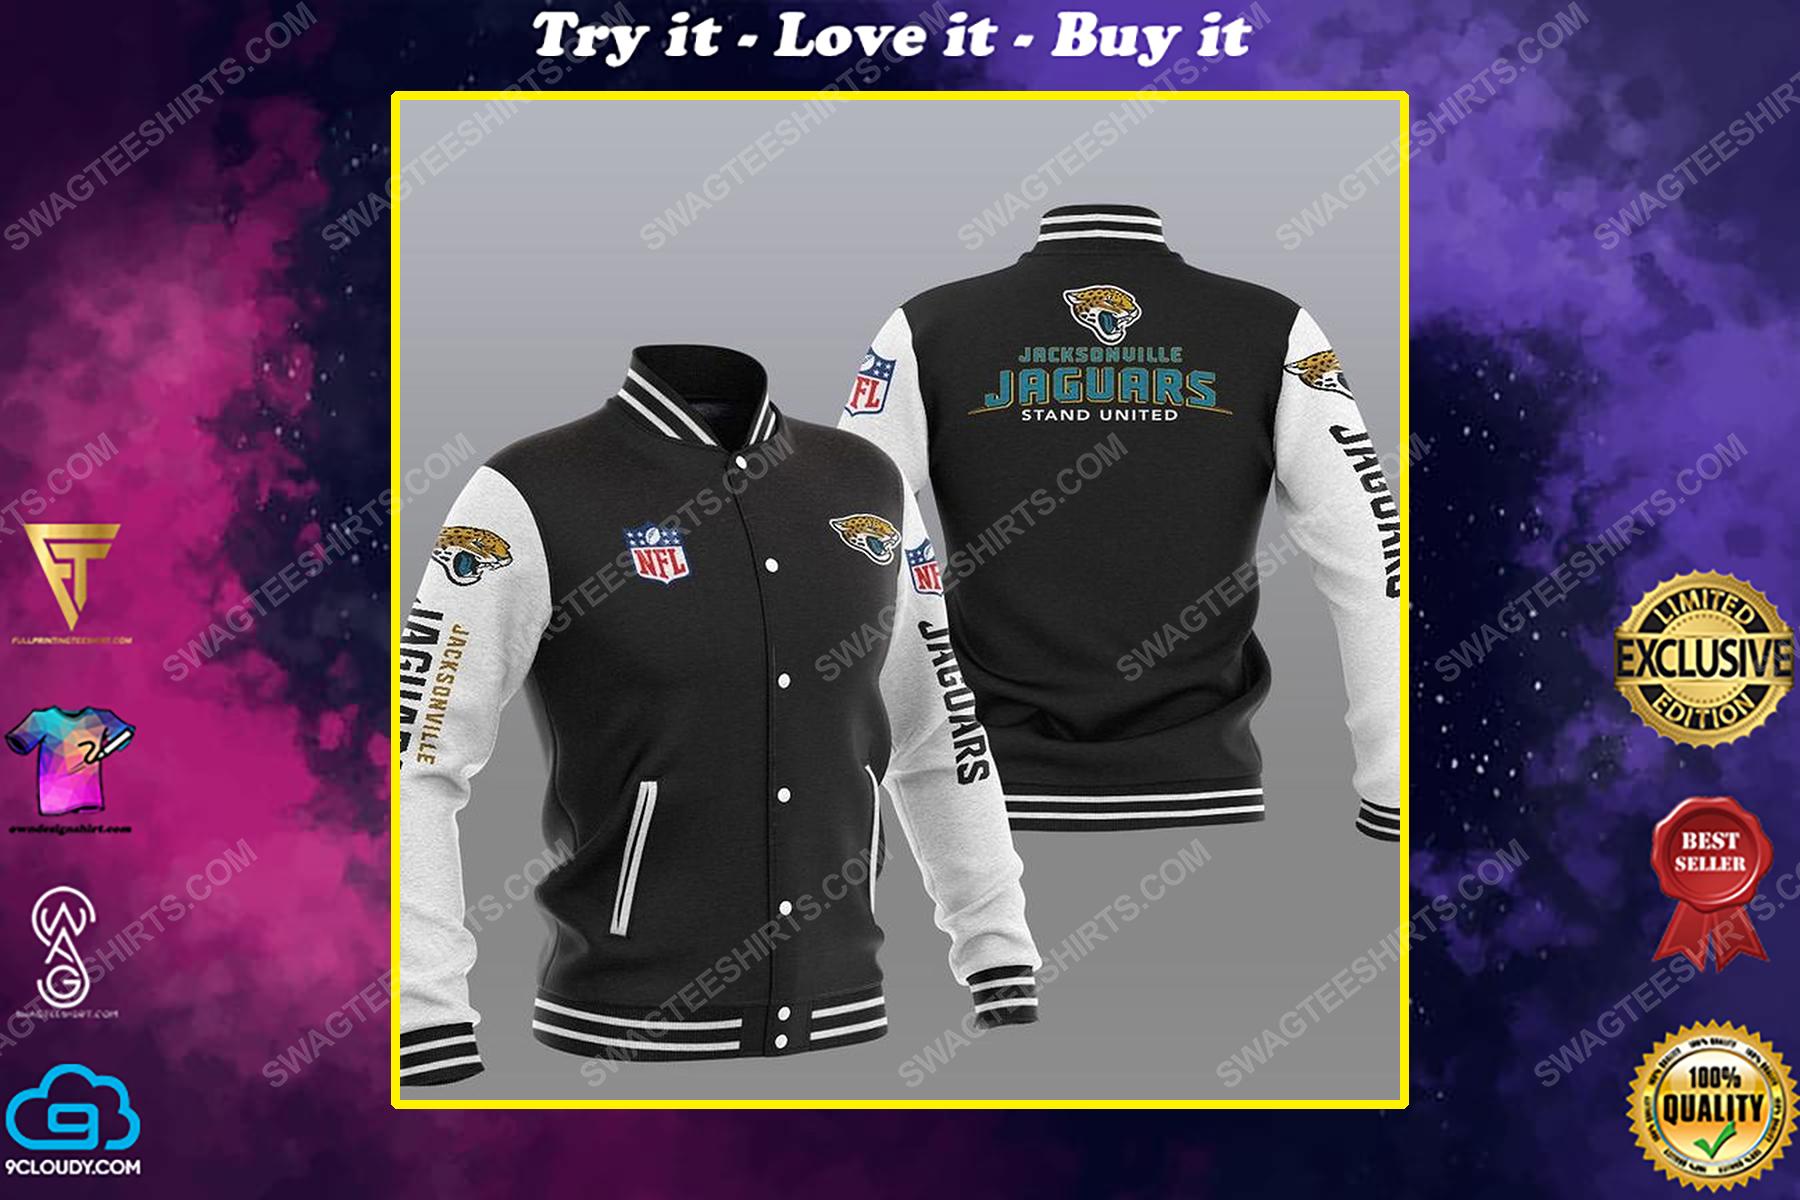 Jacksonville jaguars stand united all over print shirt